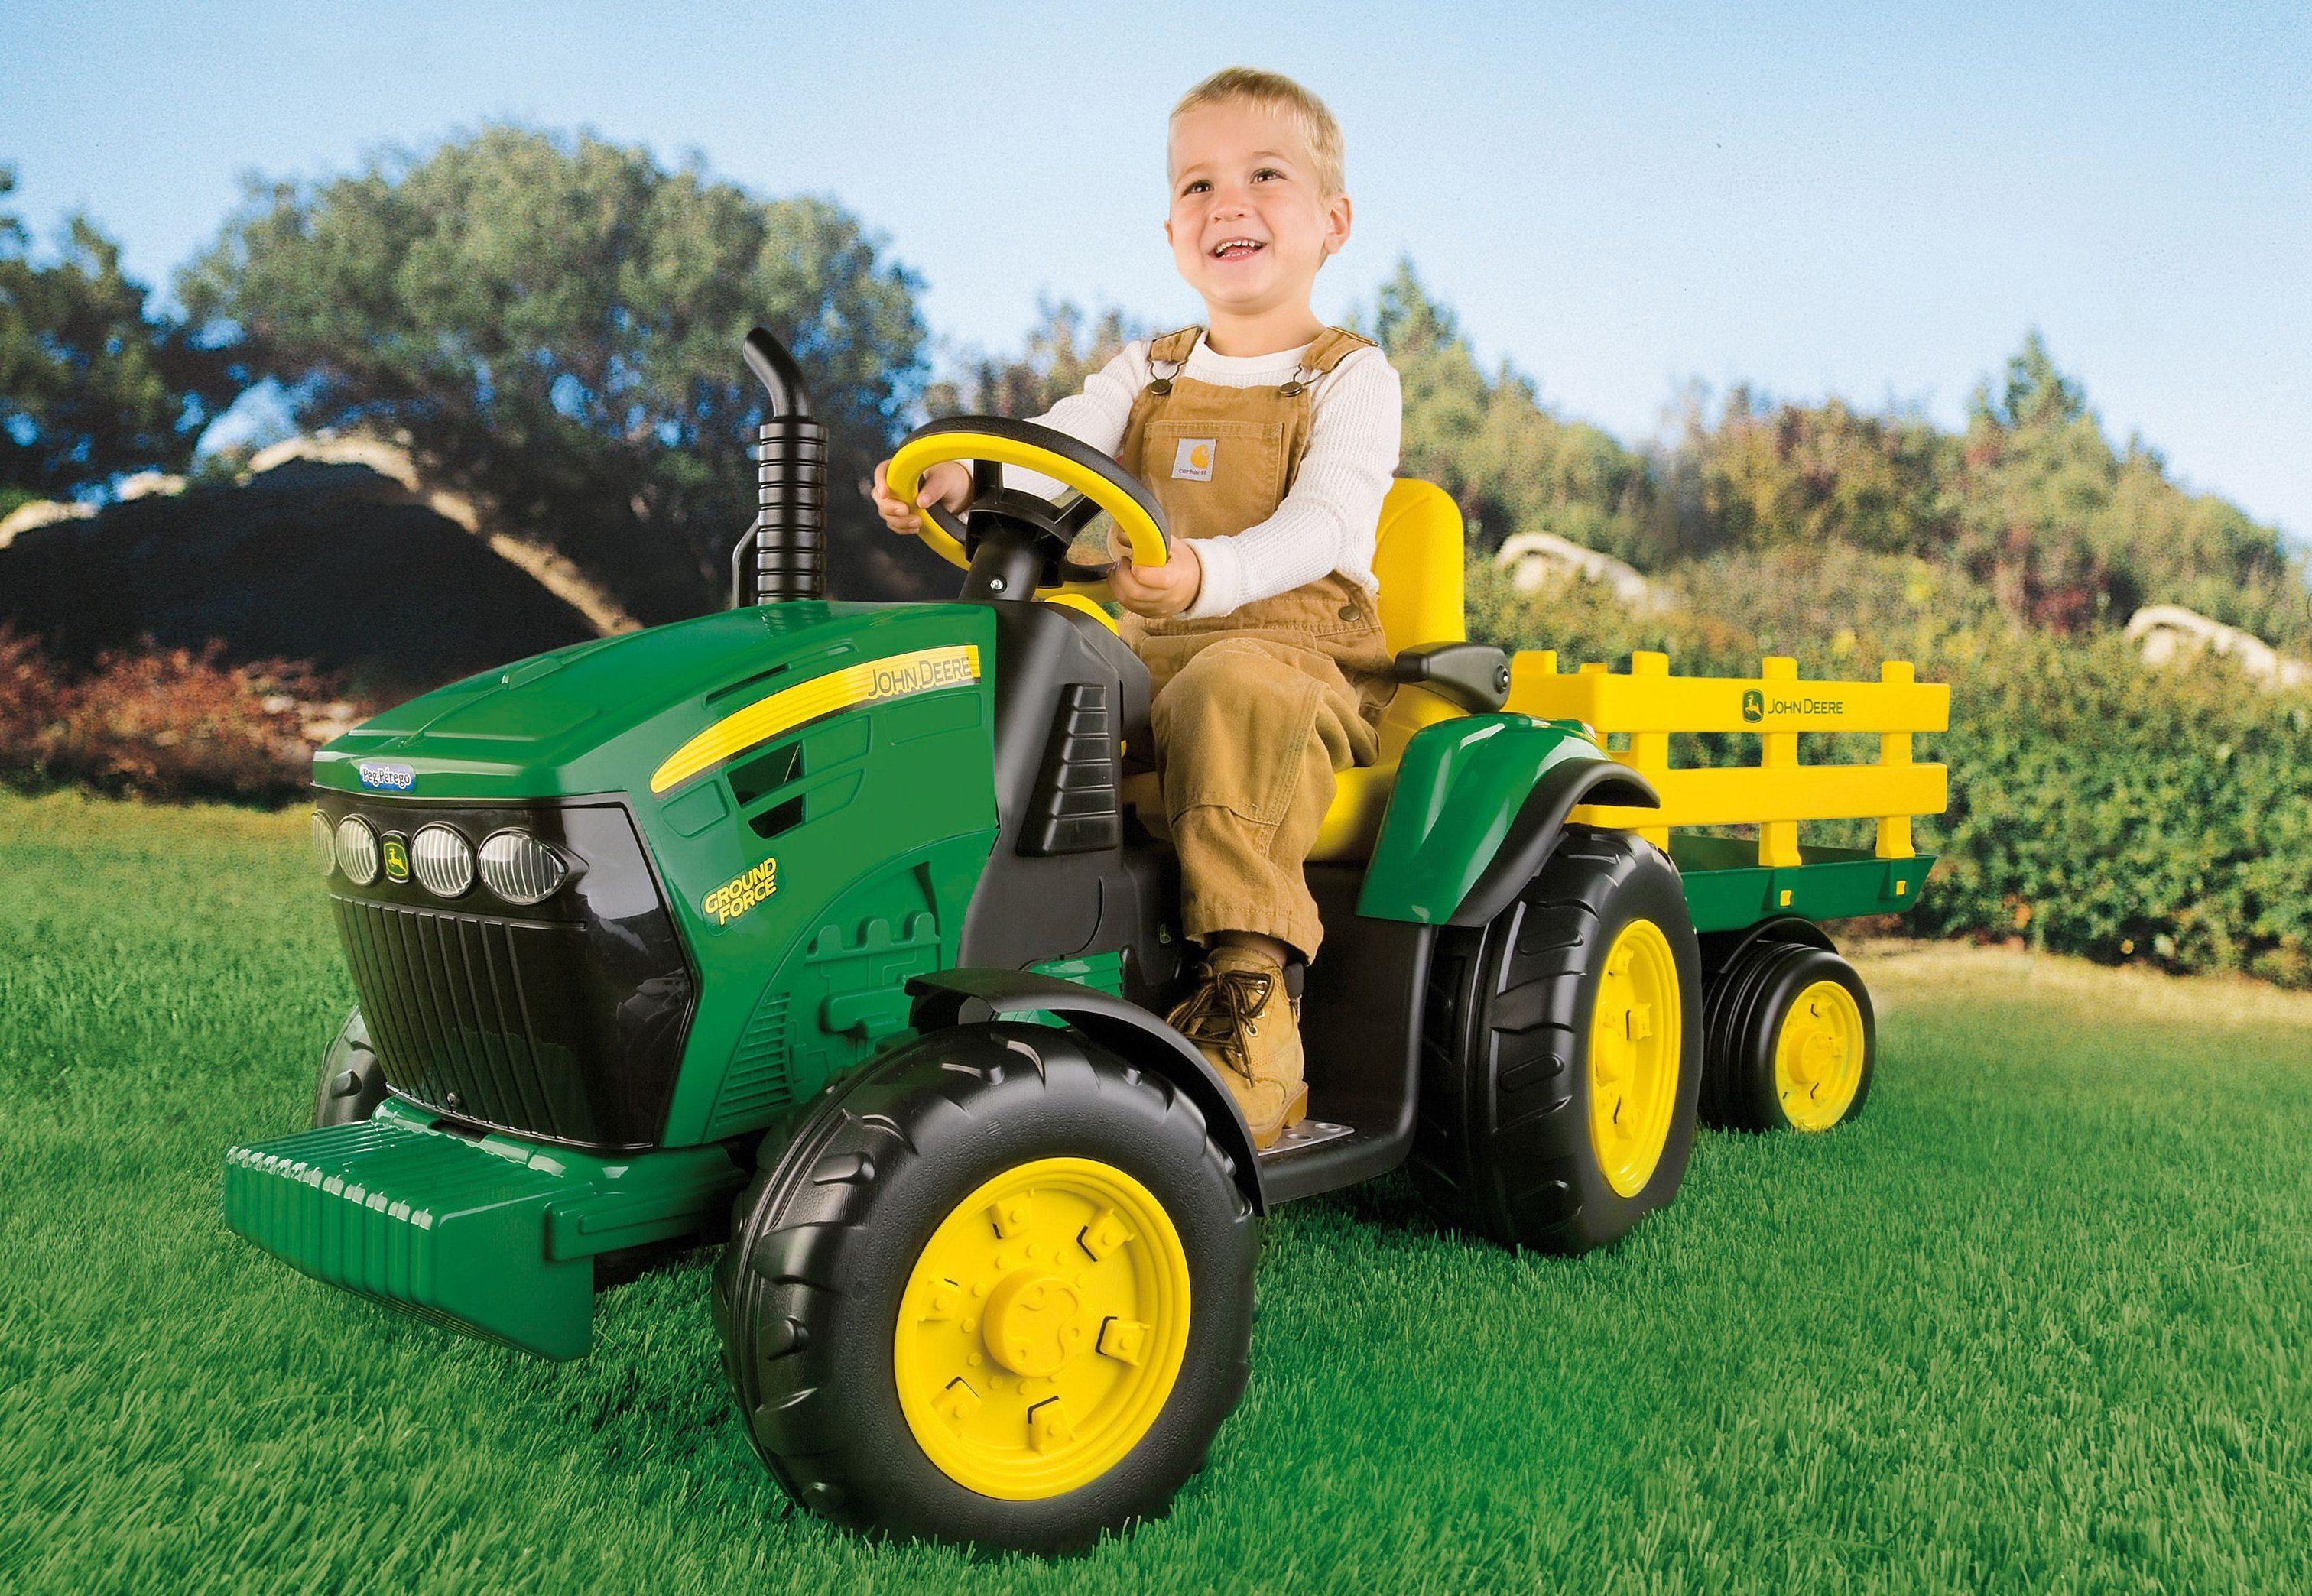 Peg-Pérego Elektrofahrzeug für Kinder Traktor mit Anhänger »John Deere Ground Force - 12 Volt«